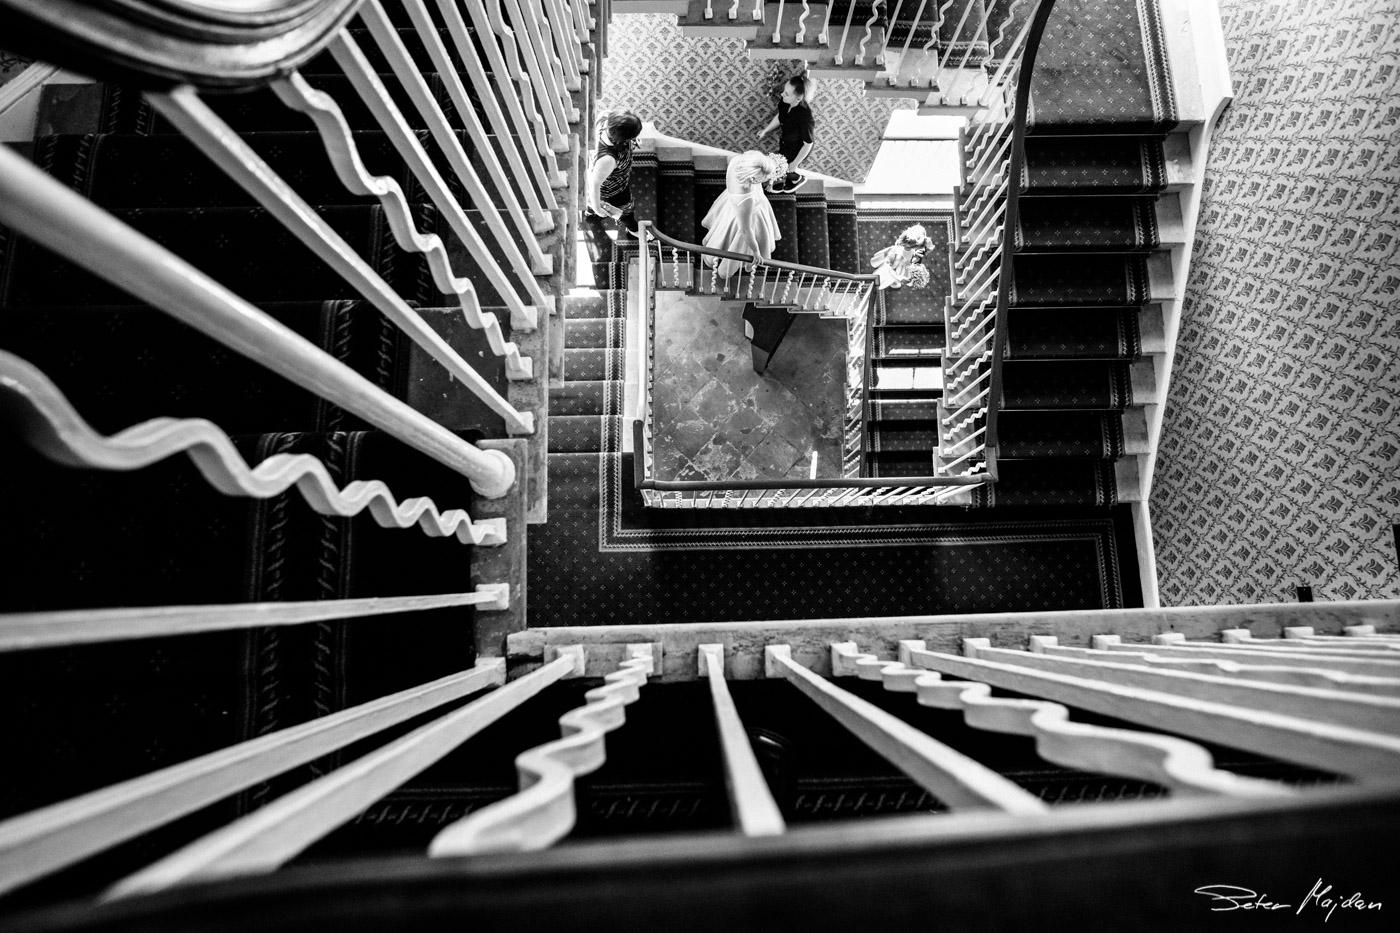 Colwick-hall-wedding-photography-11.jpg